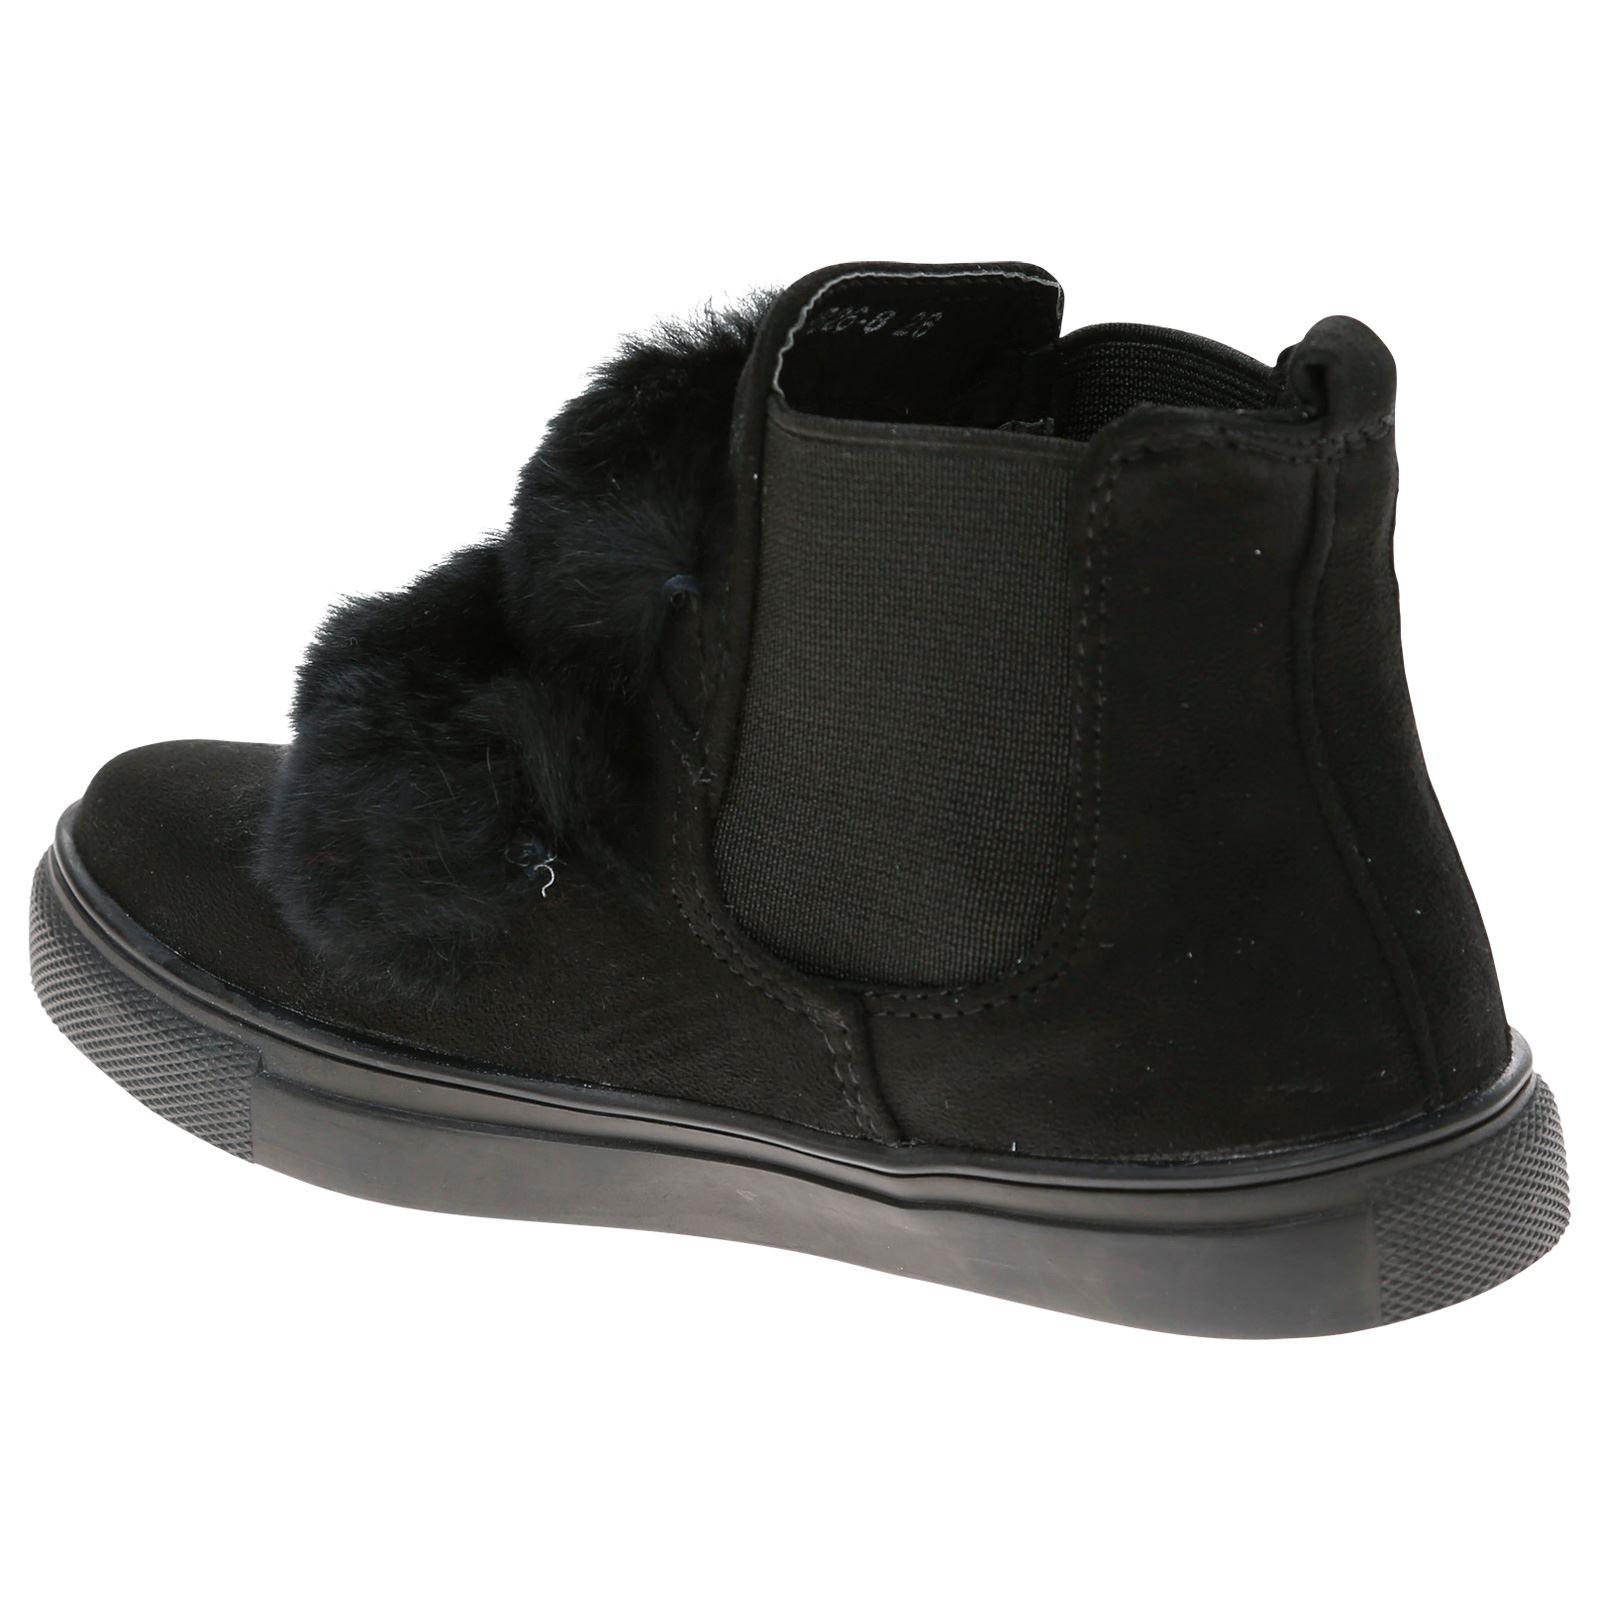 Lili Girls Kids Flat Low Heels High Top Trainers Plimsolls Fur Chelsea Boots New